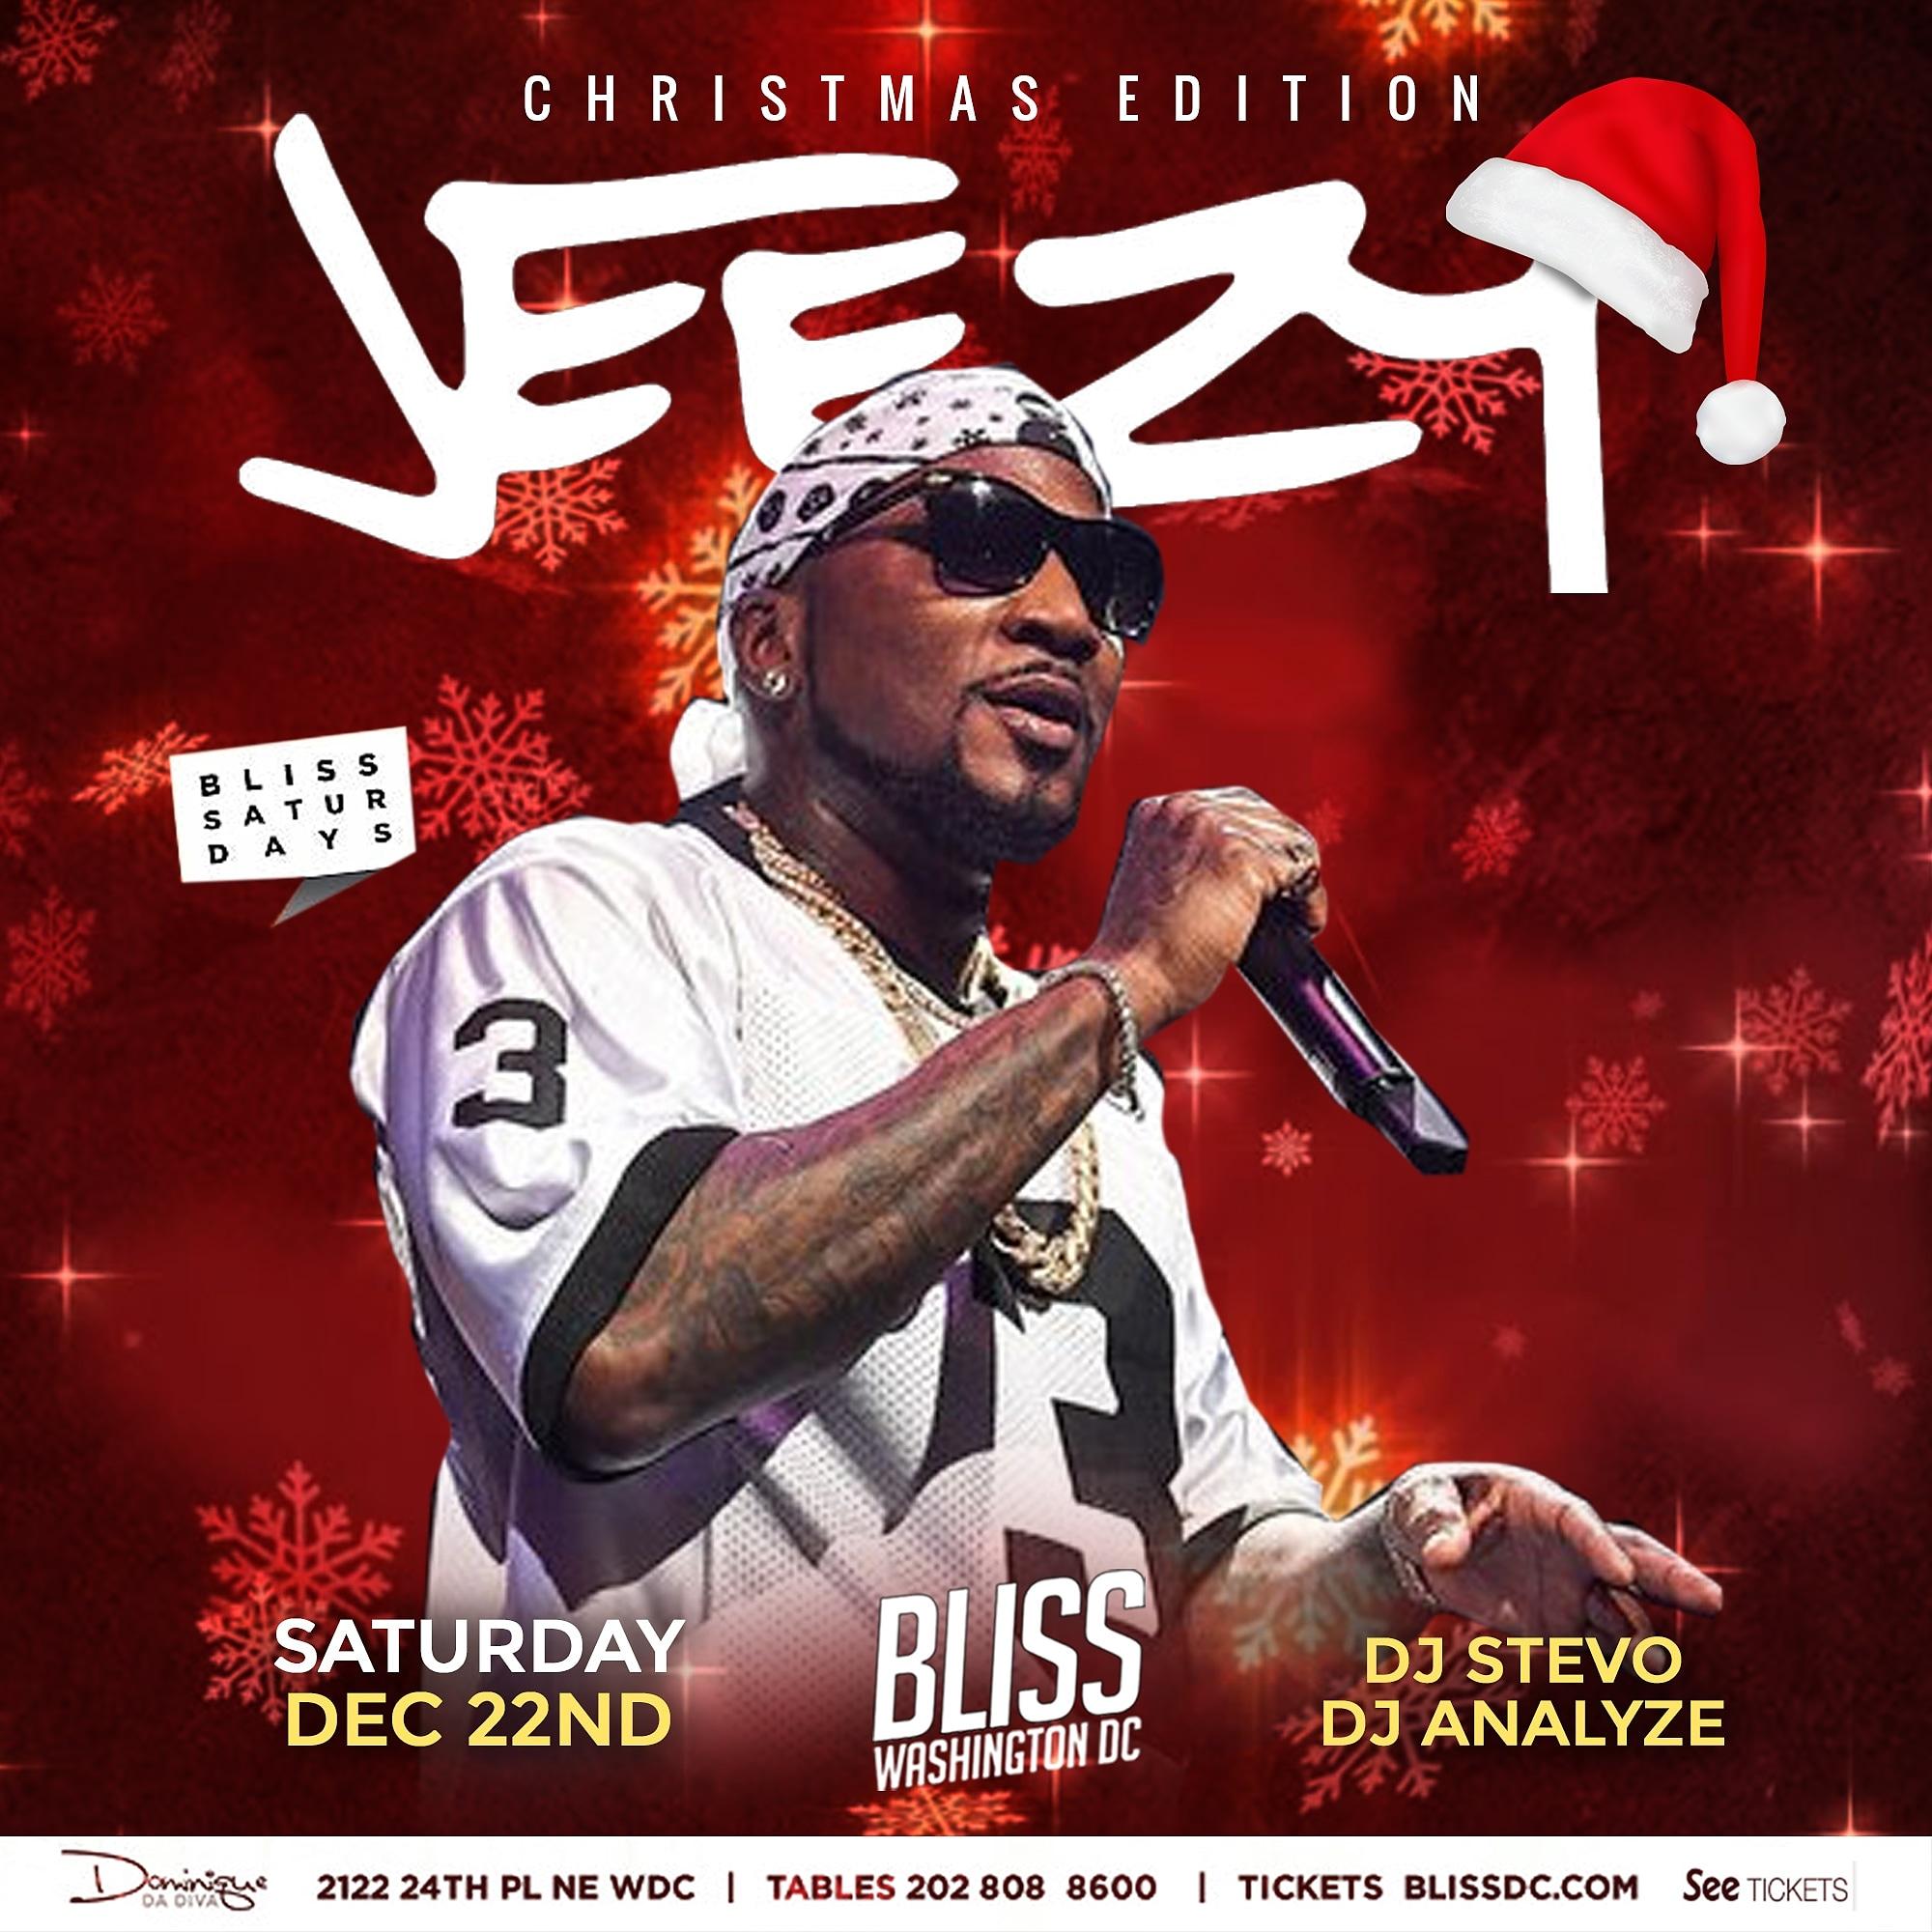 Jeezy Christmas Edition